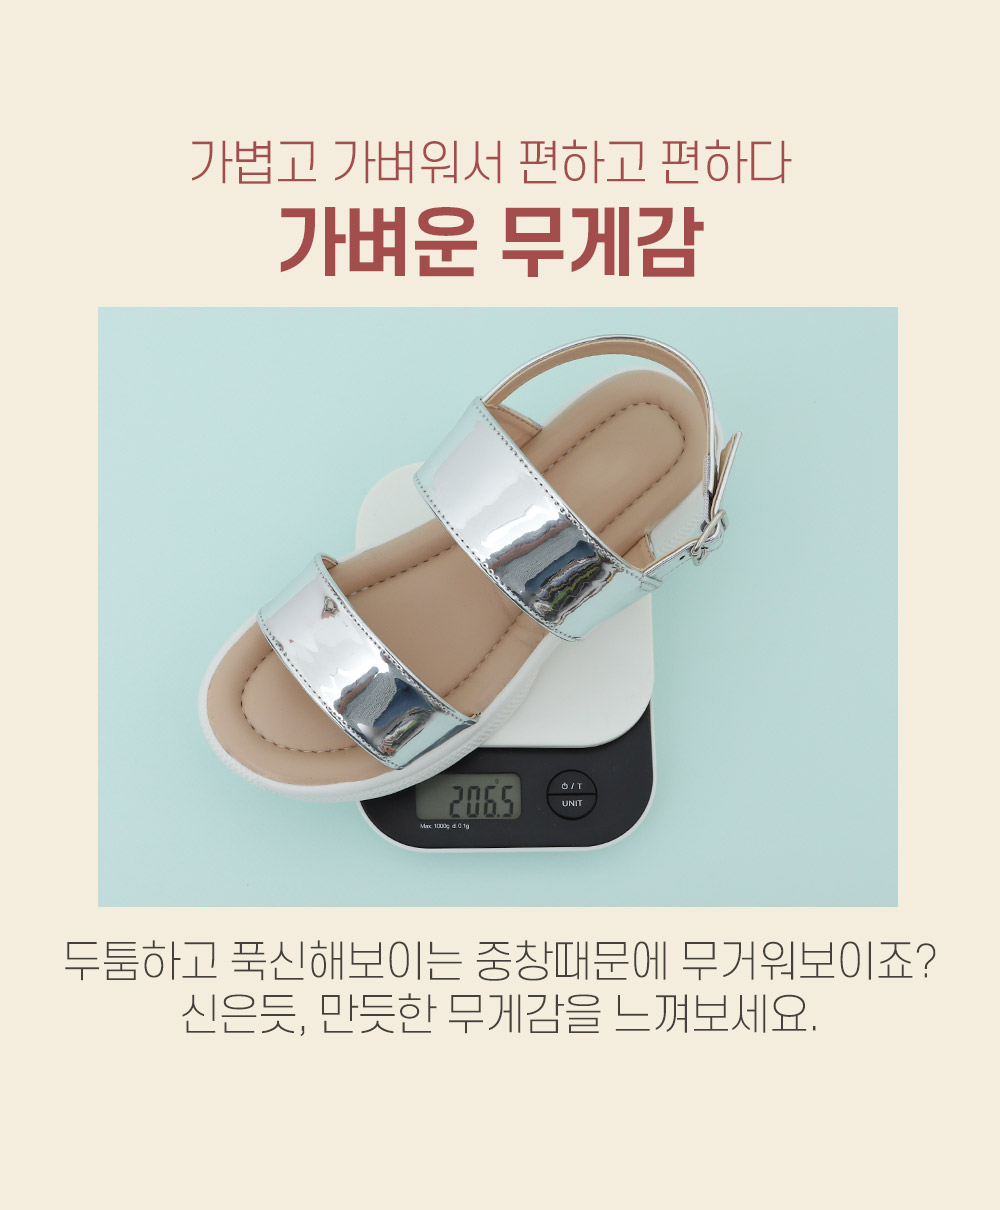 [Handmade] Casual Strap Platform Sandals-Holiholic